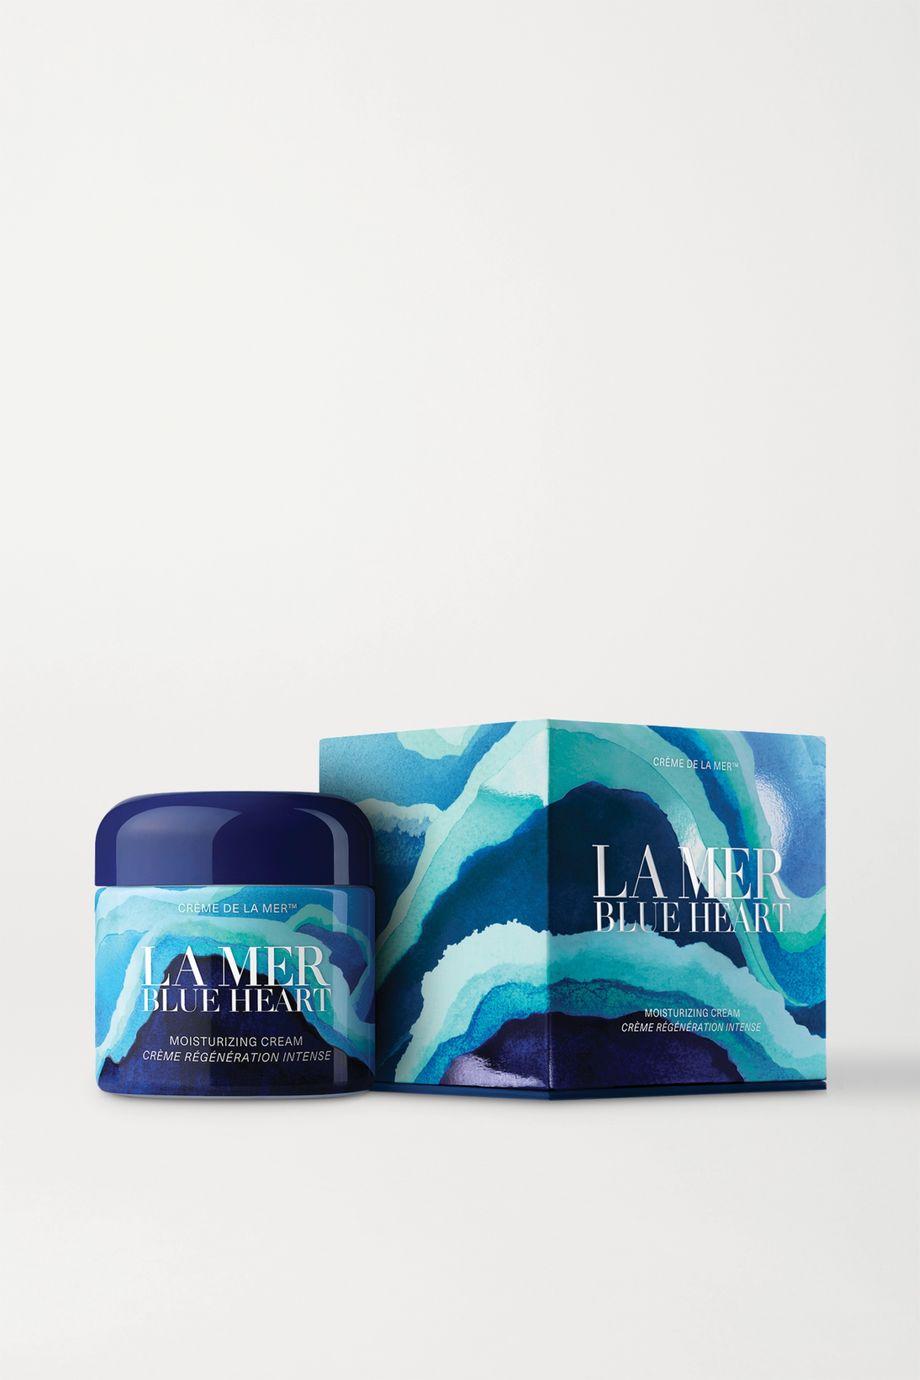 La Mer Crème de la Mer Blue Heart, 100 ml – Creme